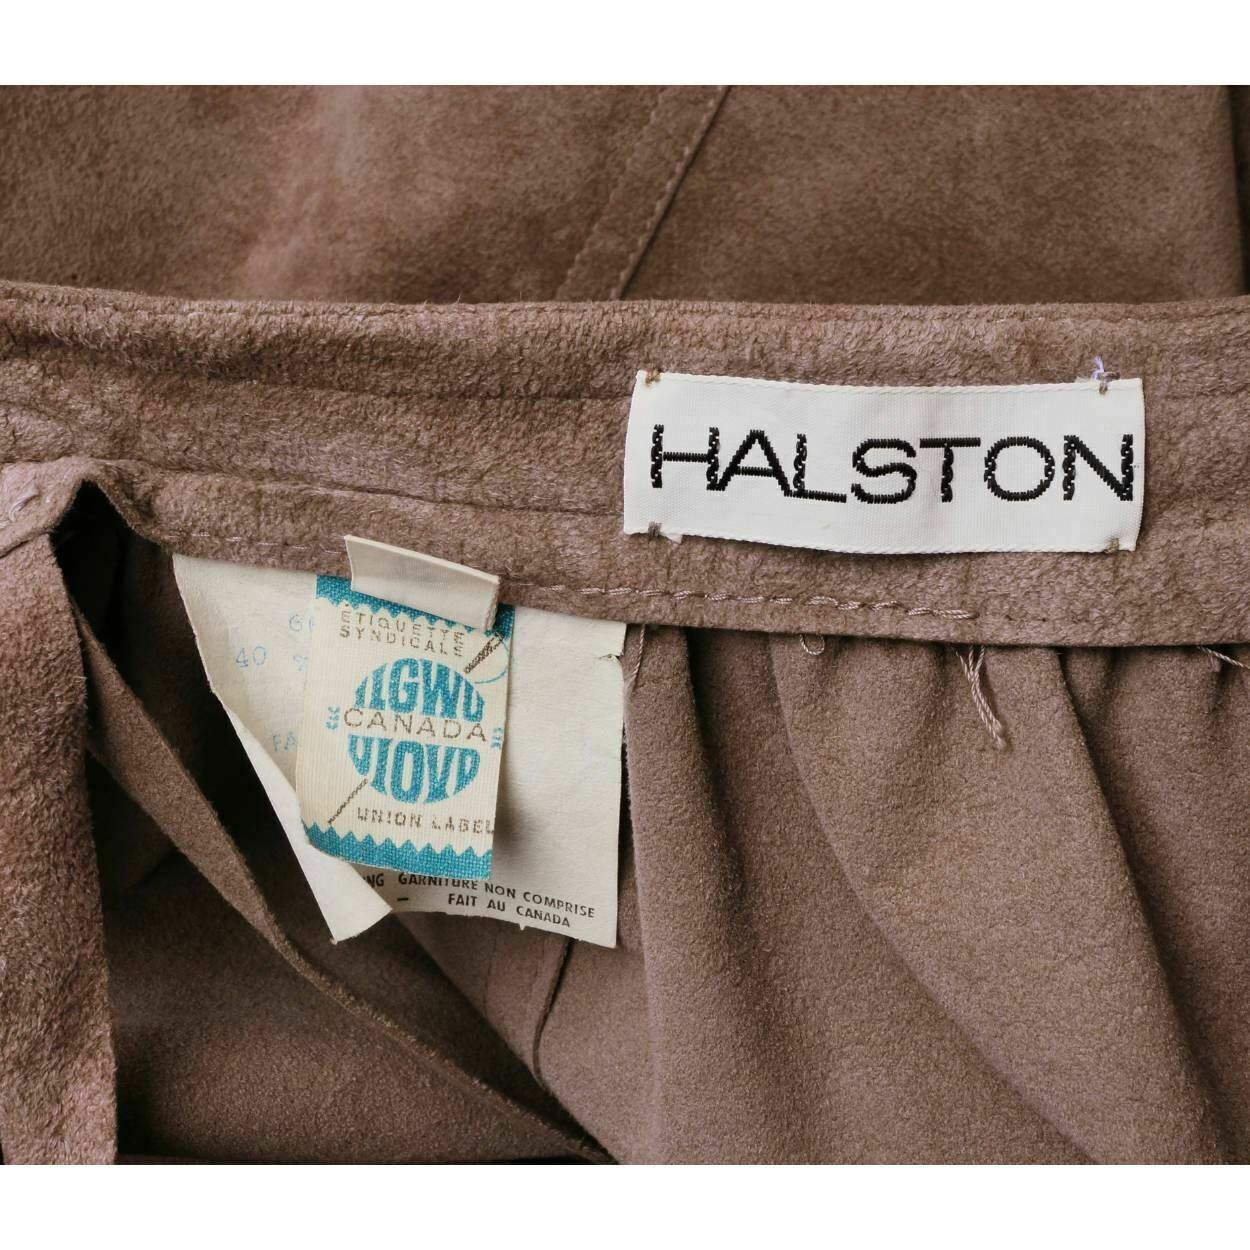 Vintage 1970s Halston Ultrasuede Taupe Maxi Skirt - image 4